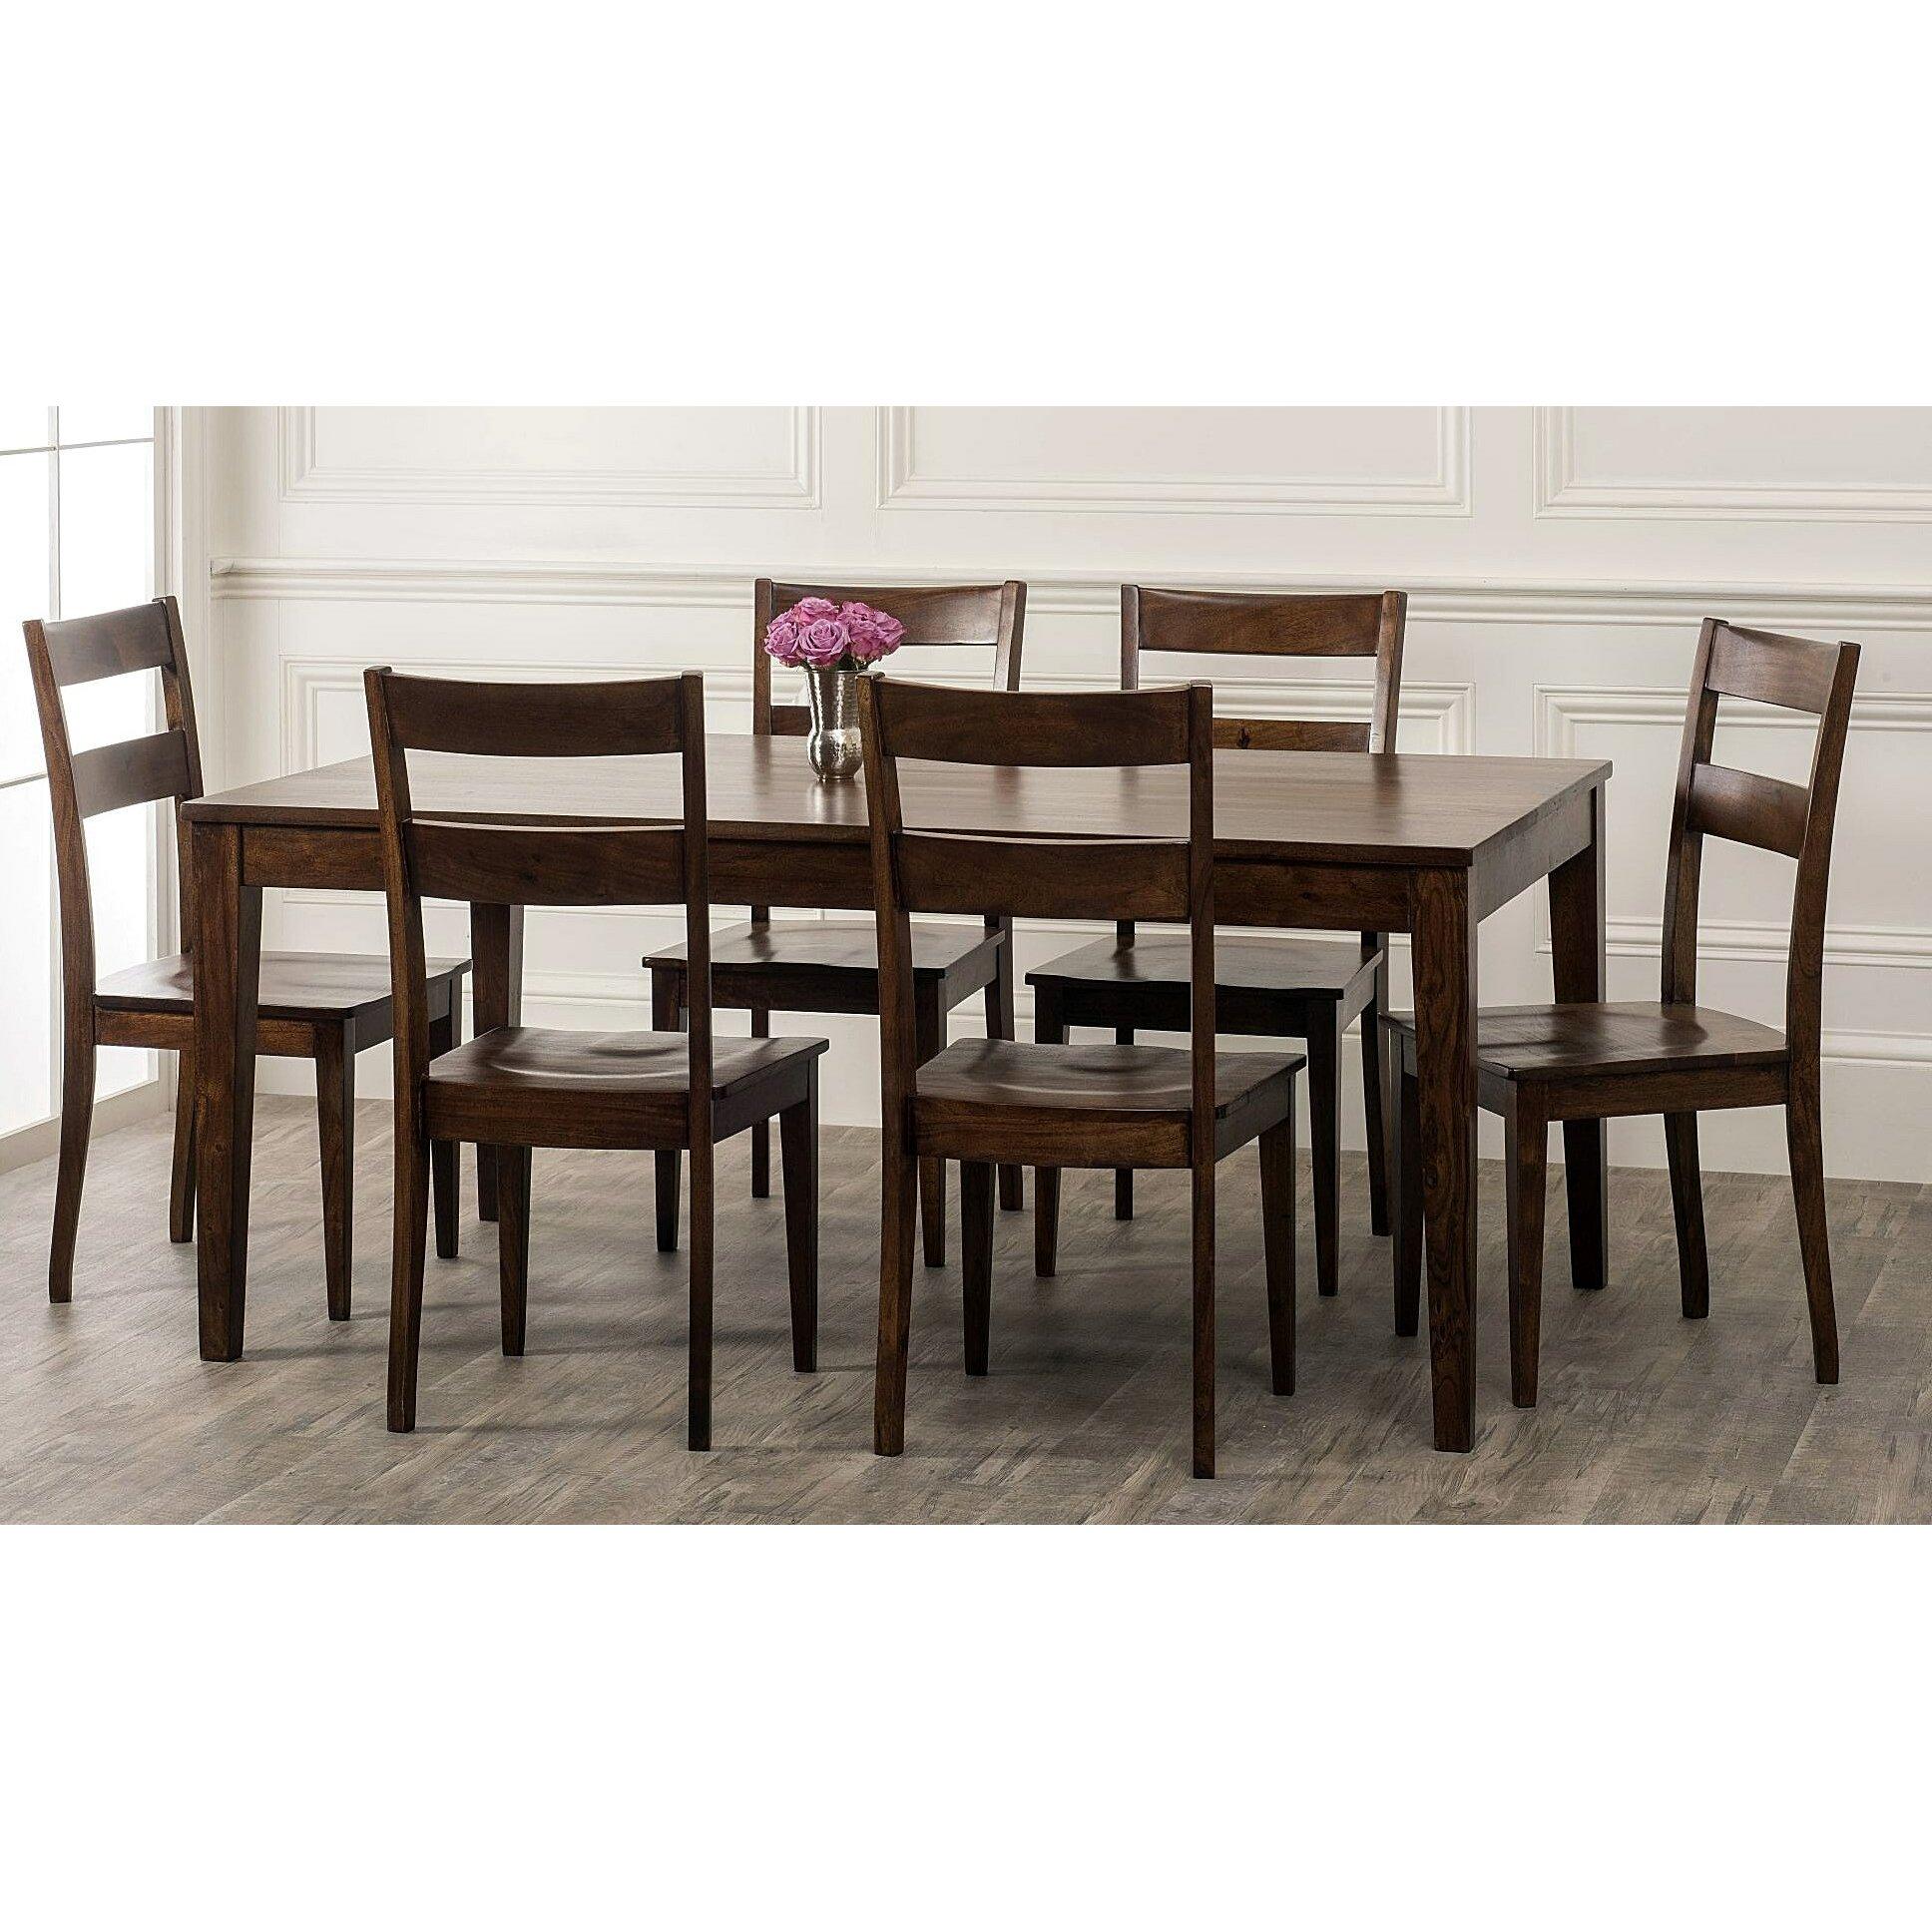 William Sonoma Dining Room Chairs